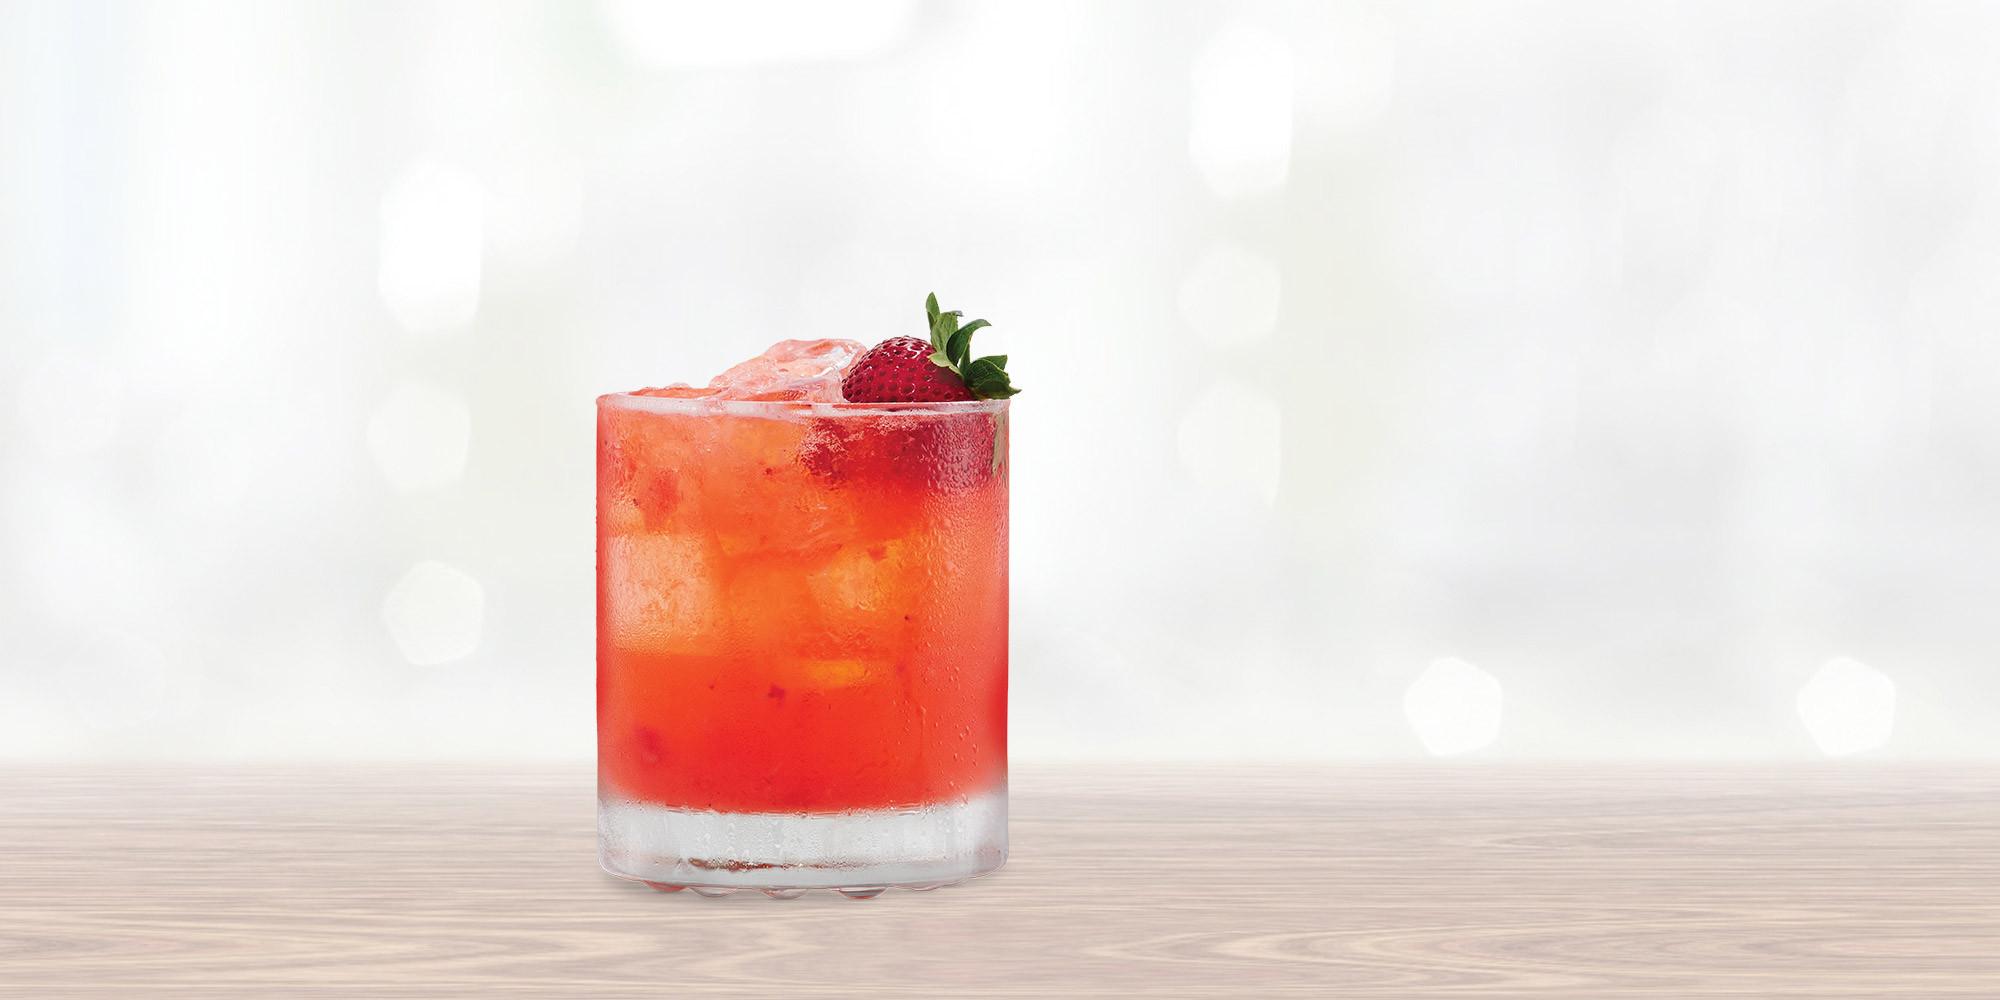 Strawberry Vodka Drinks  Strawberry Smash with SMIRNOFF Strawberry Recipe